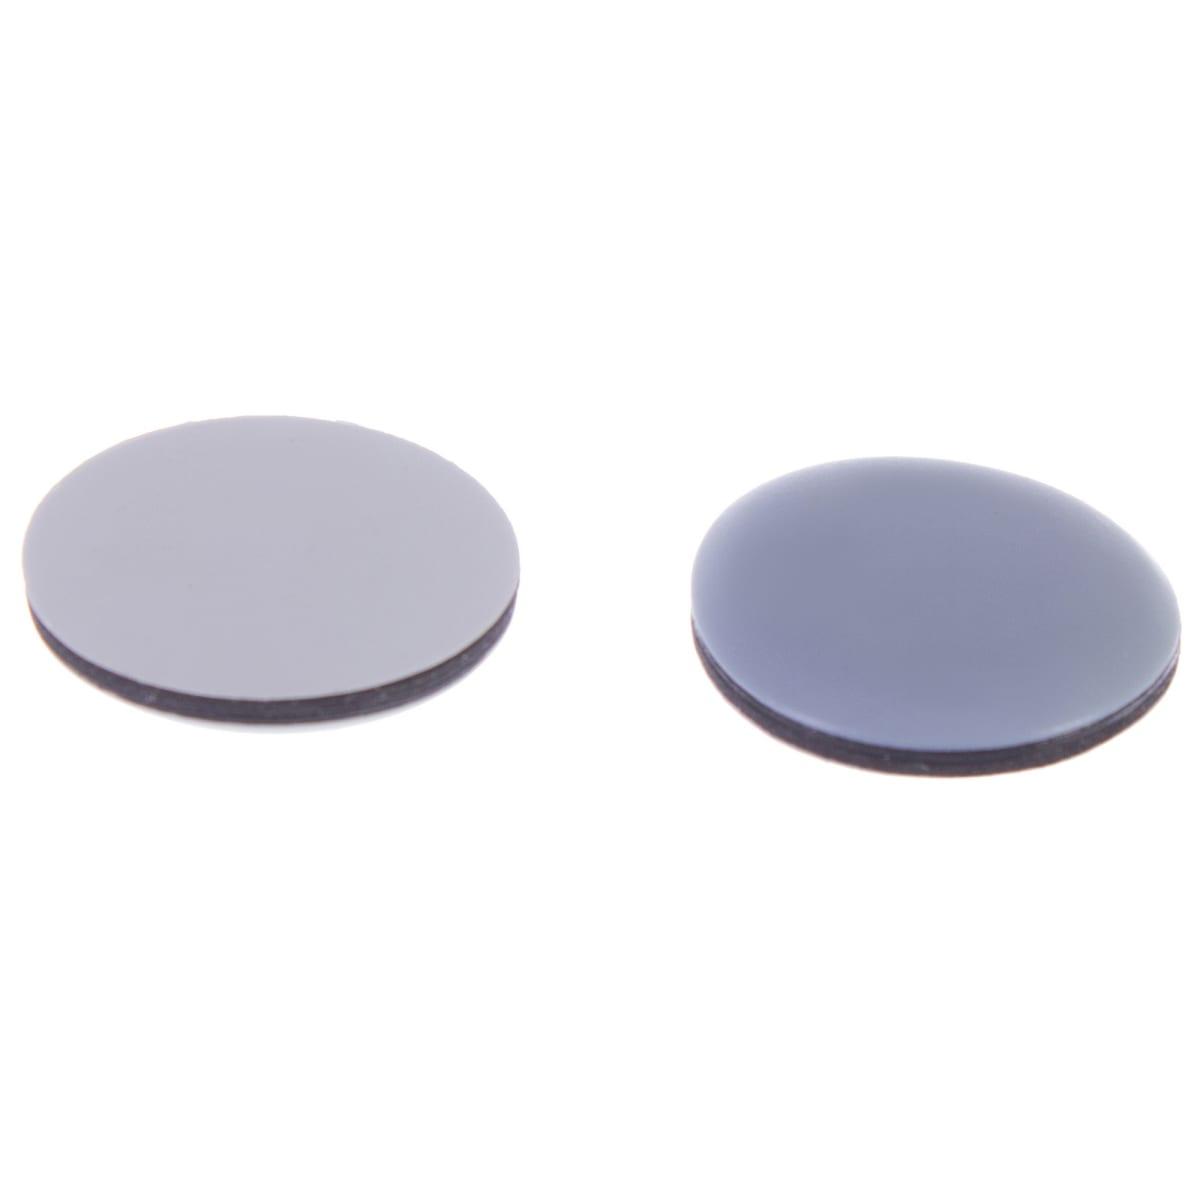 Накладки Standers PTFE 50 мм, круглые, пластик, цвет серый, 4 шт.